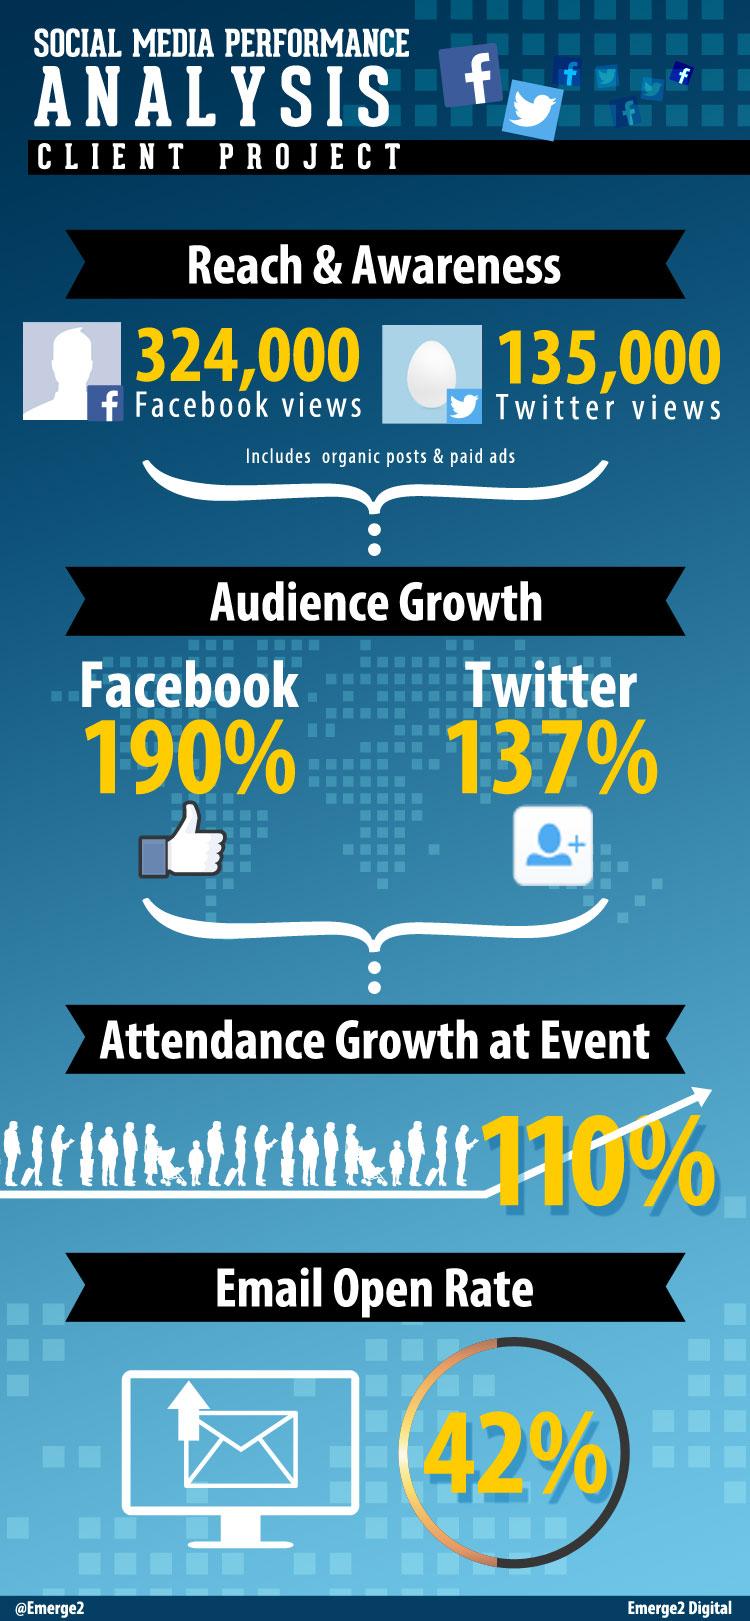 Social Media Performance Analysis